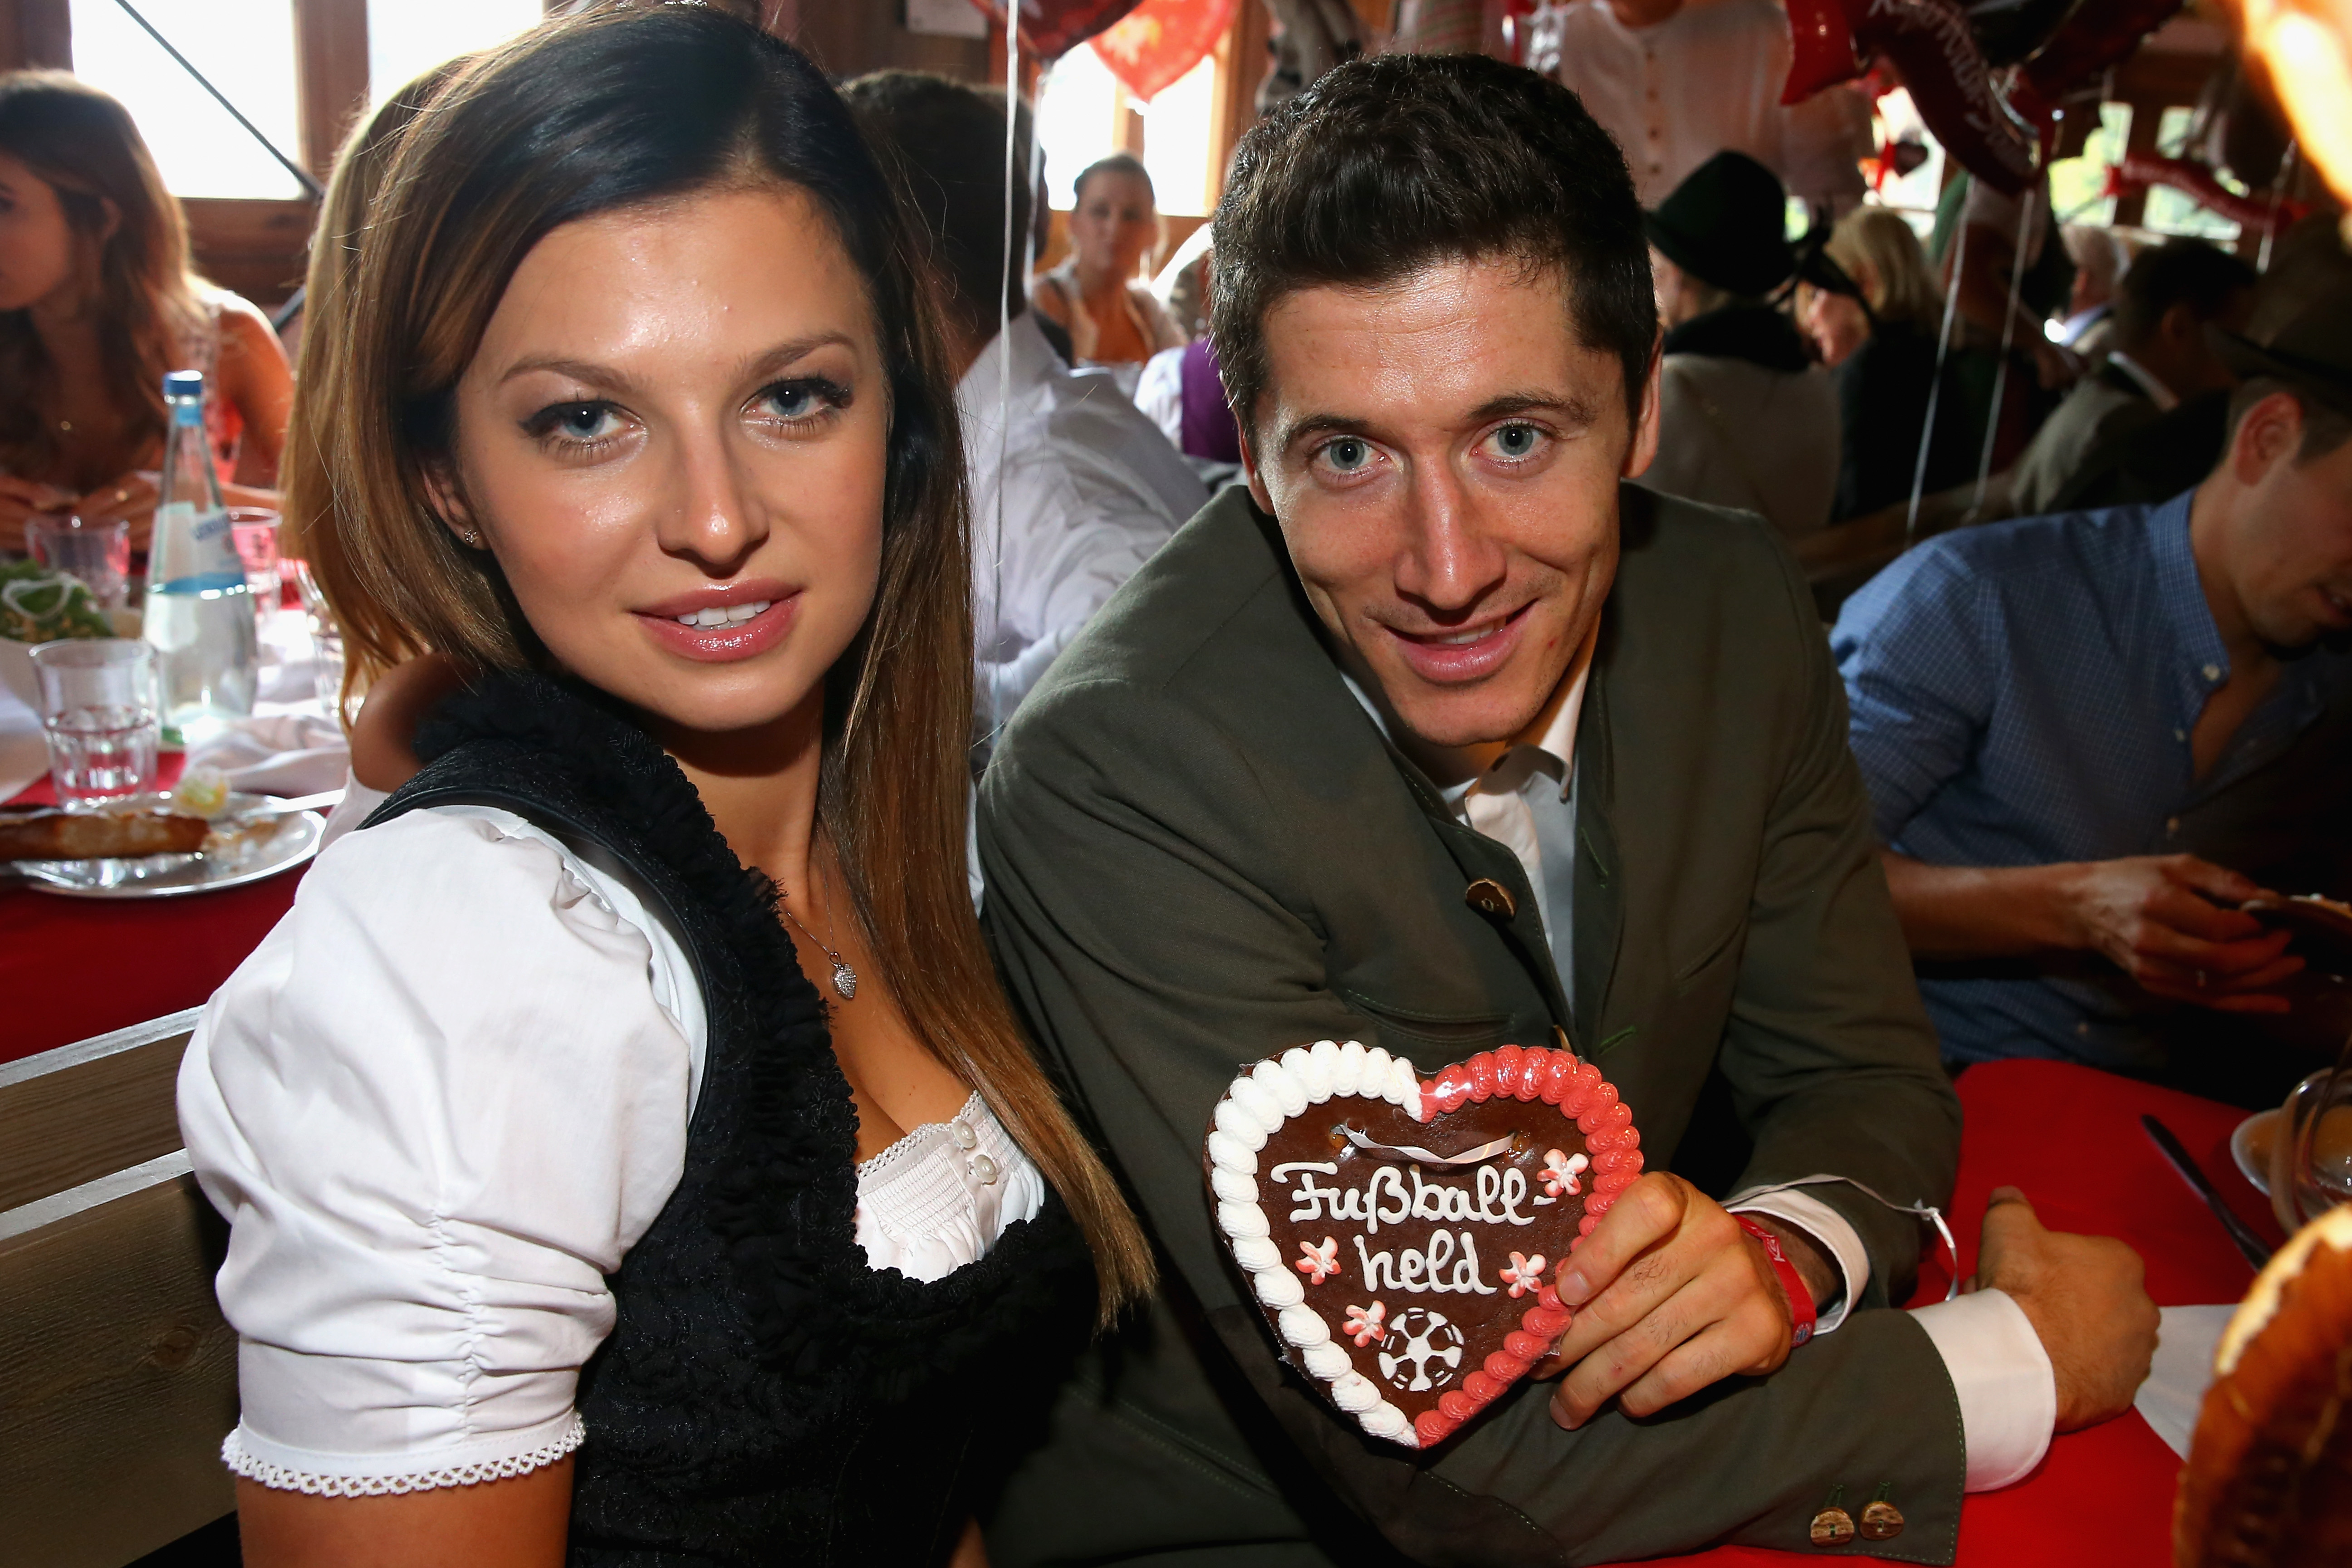 Bayern's Robert Lewandowski and his partner Anna Stachurska, left, pose for a photograph as the players of FC Bayern Munich v